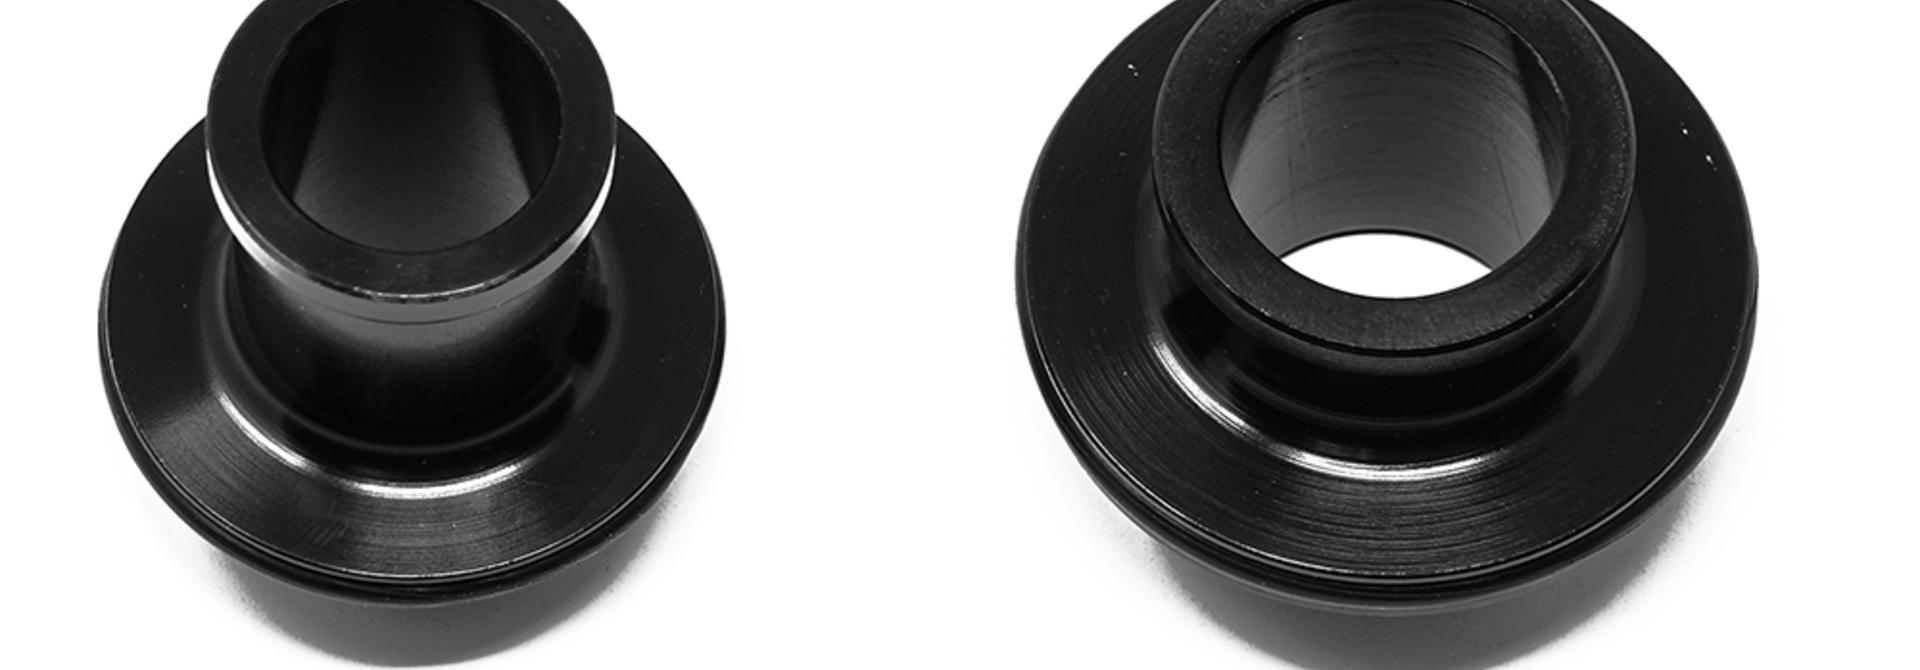 I9 Torch MTN Front Endcap Conversion 15x110 Boost Endcap Kit *32H Only*